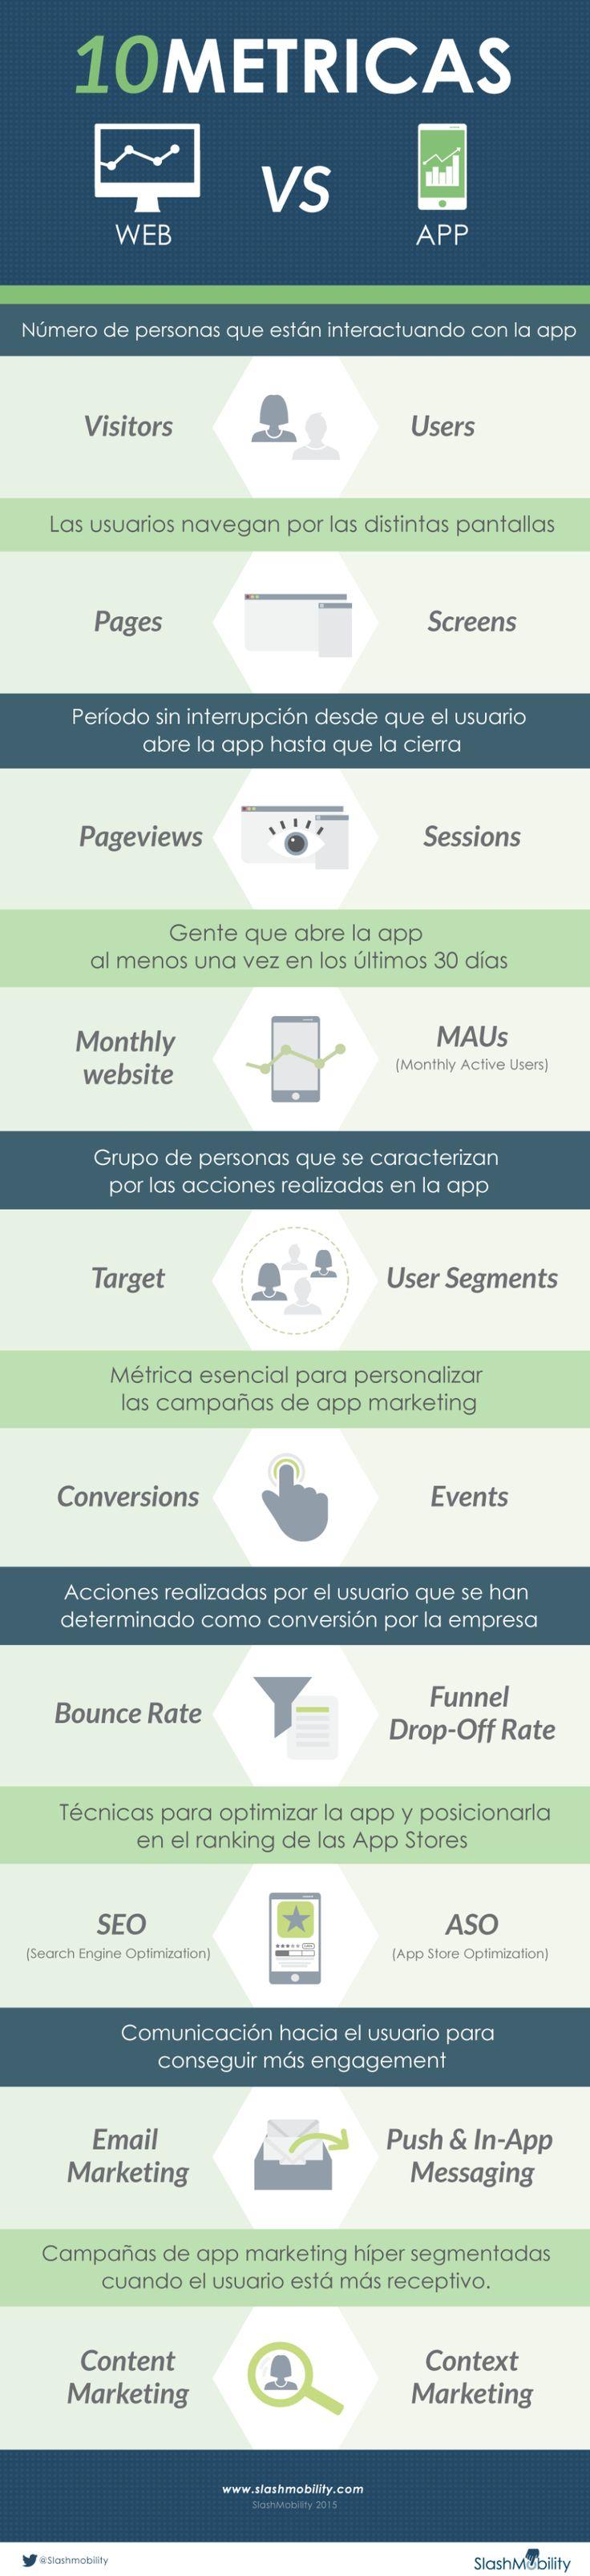 Métricas Web vs Métricas APP #infografia #infographic #marketing